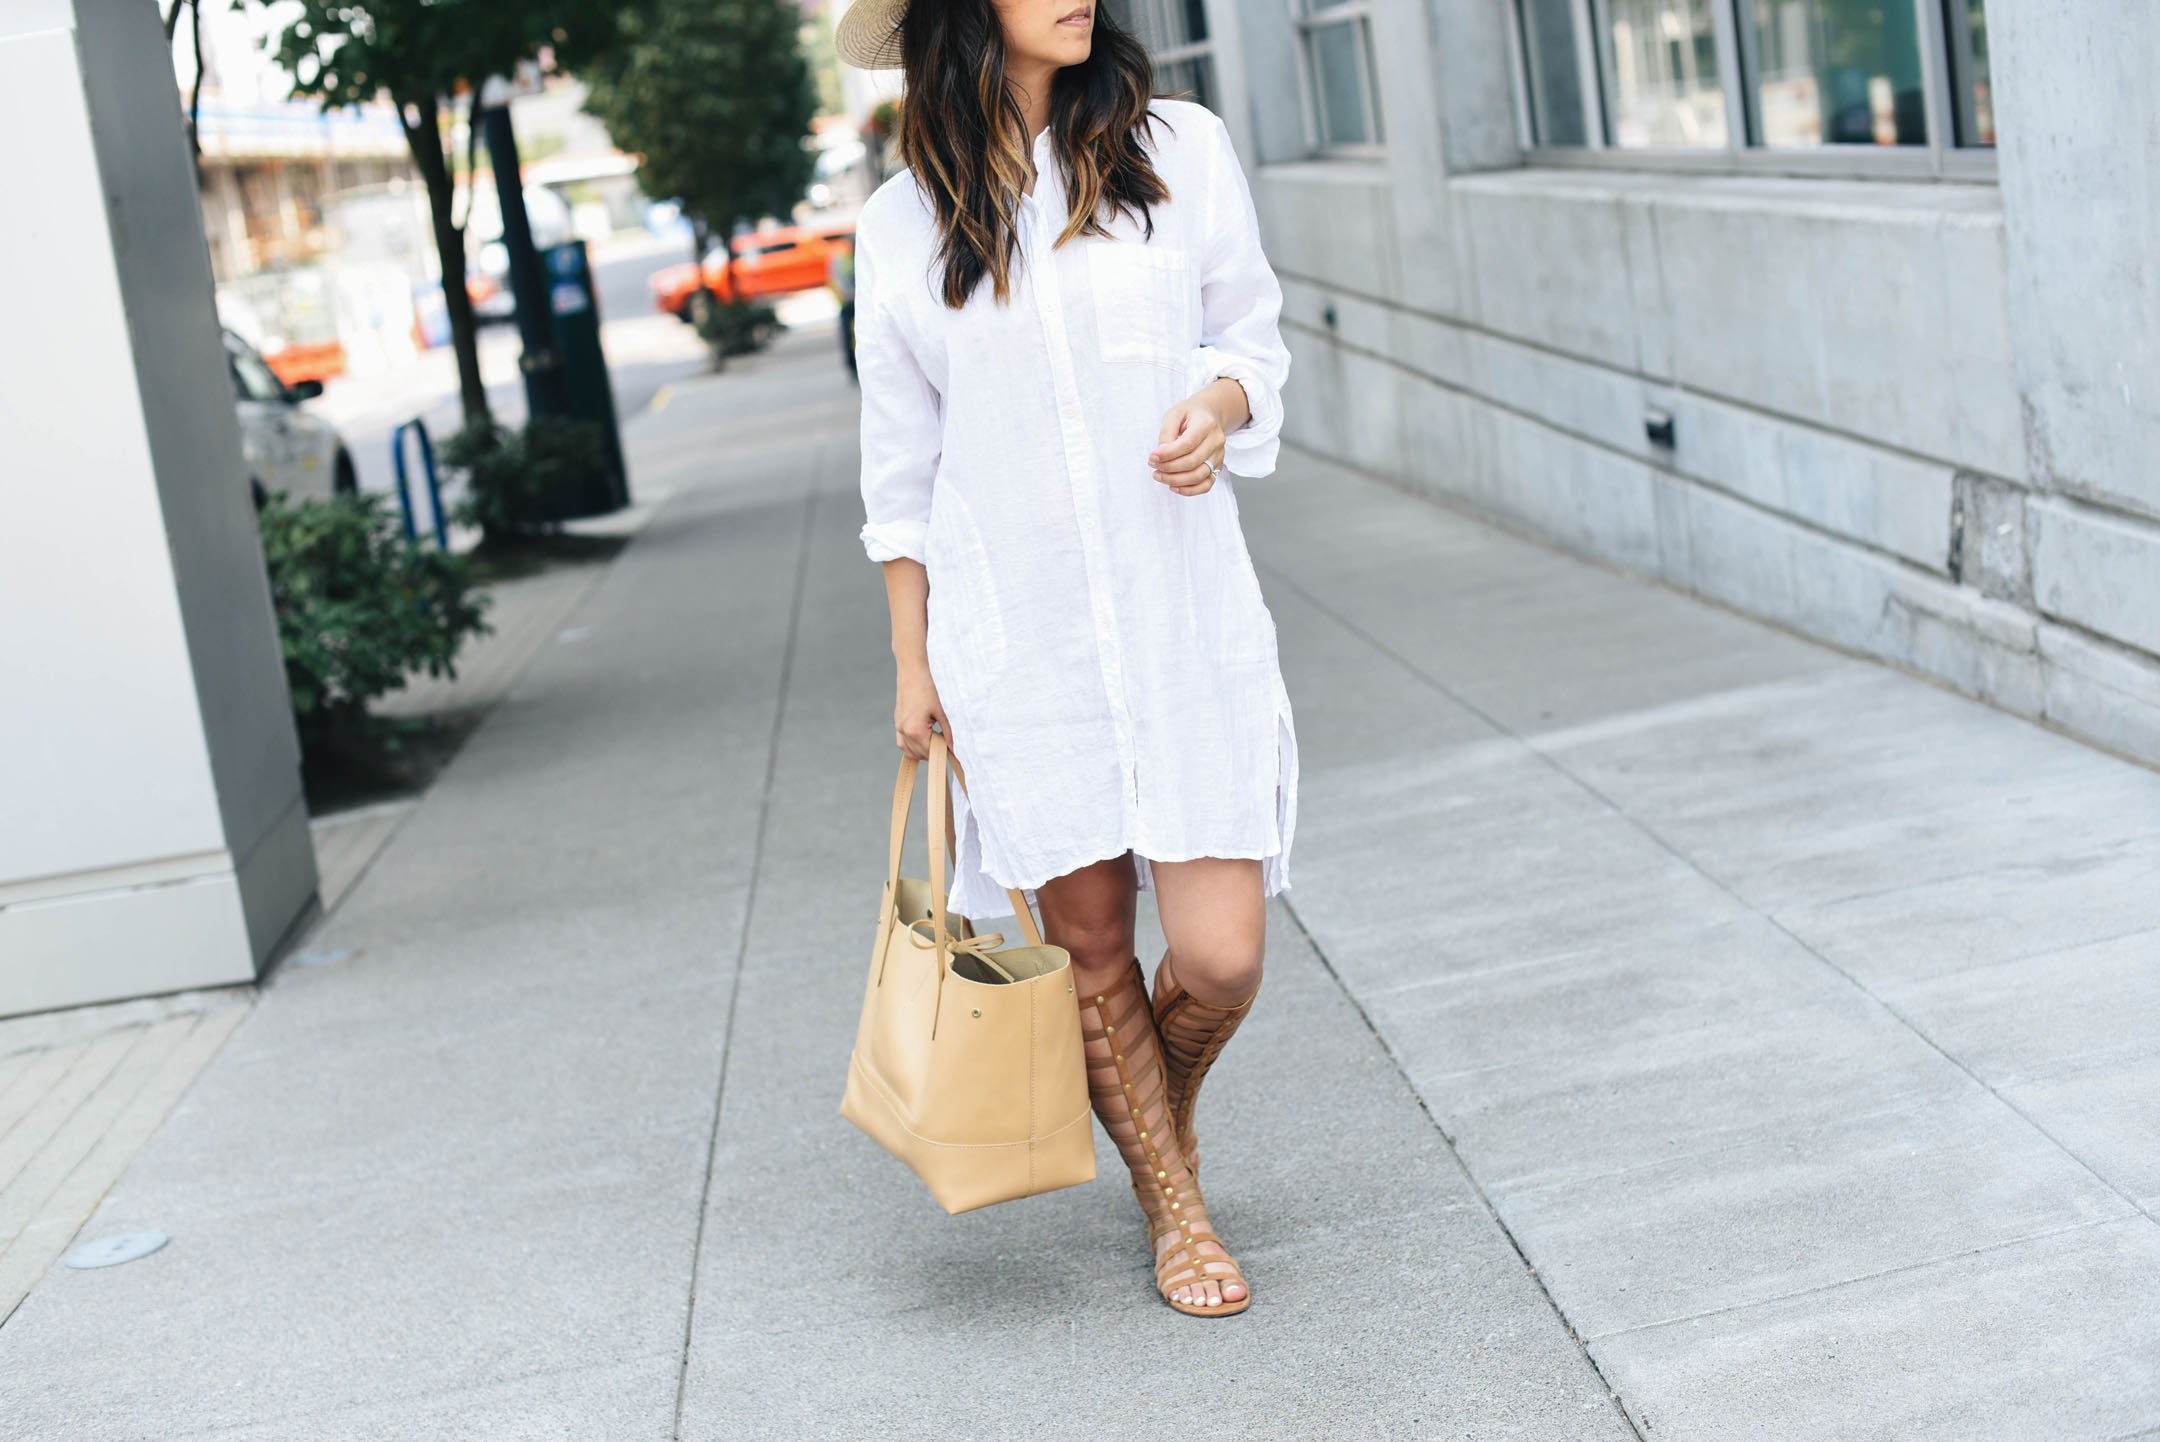 Maternity dress style